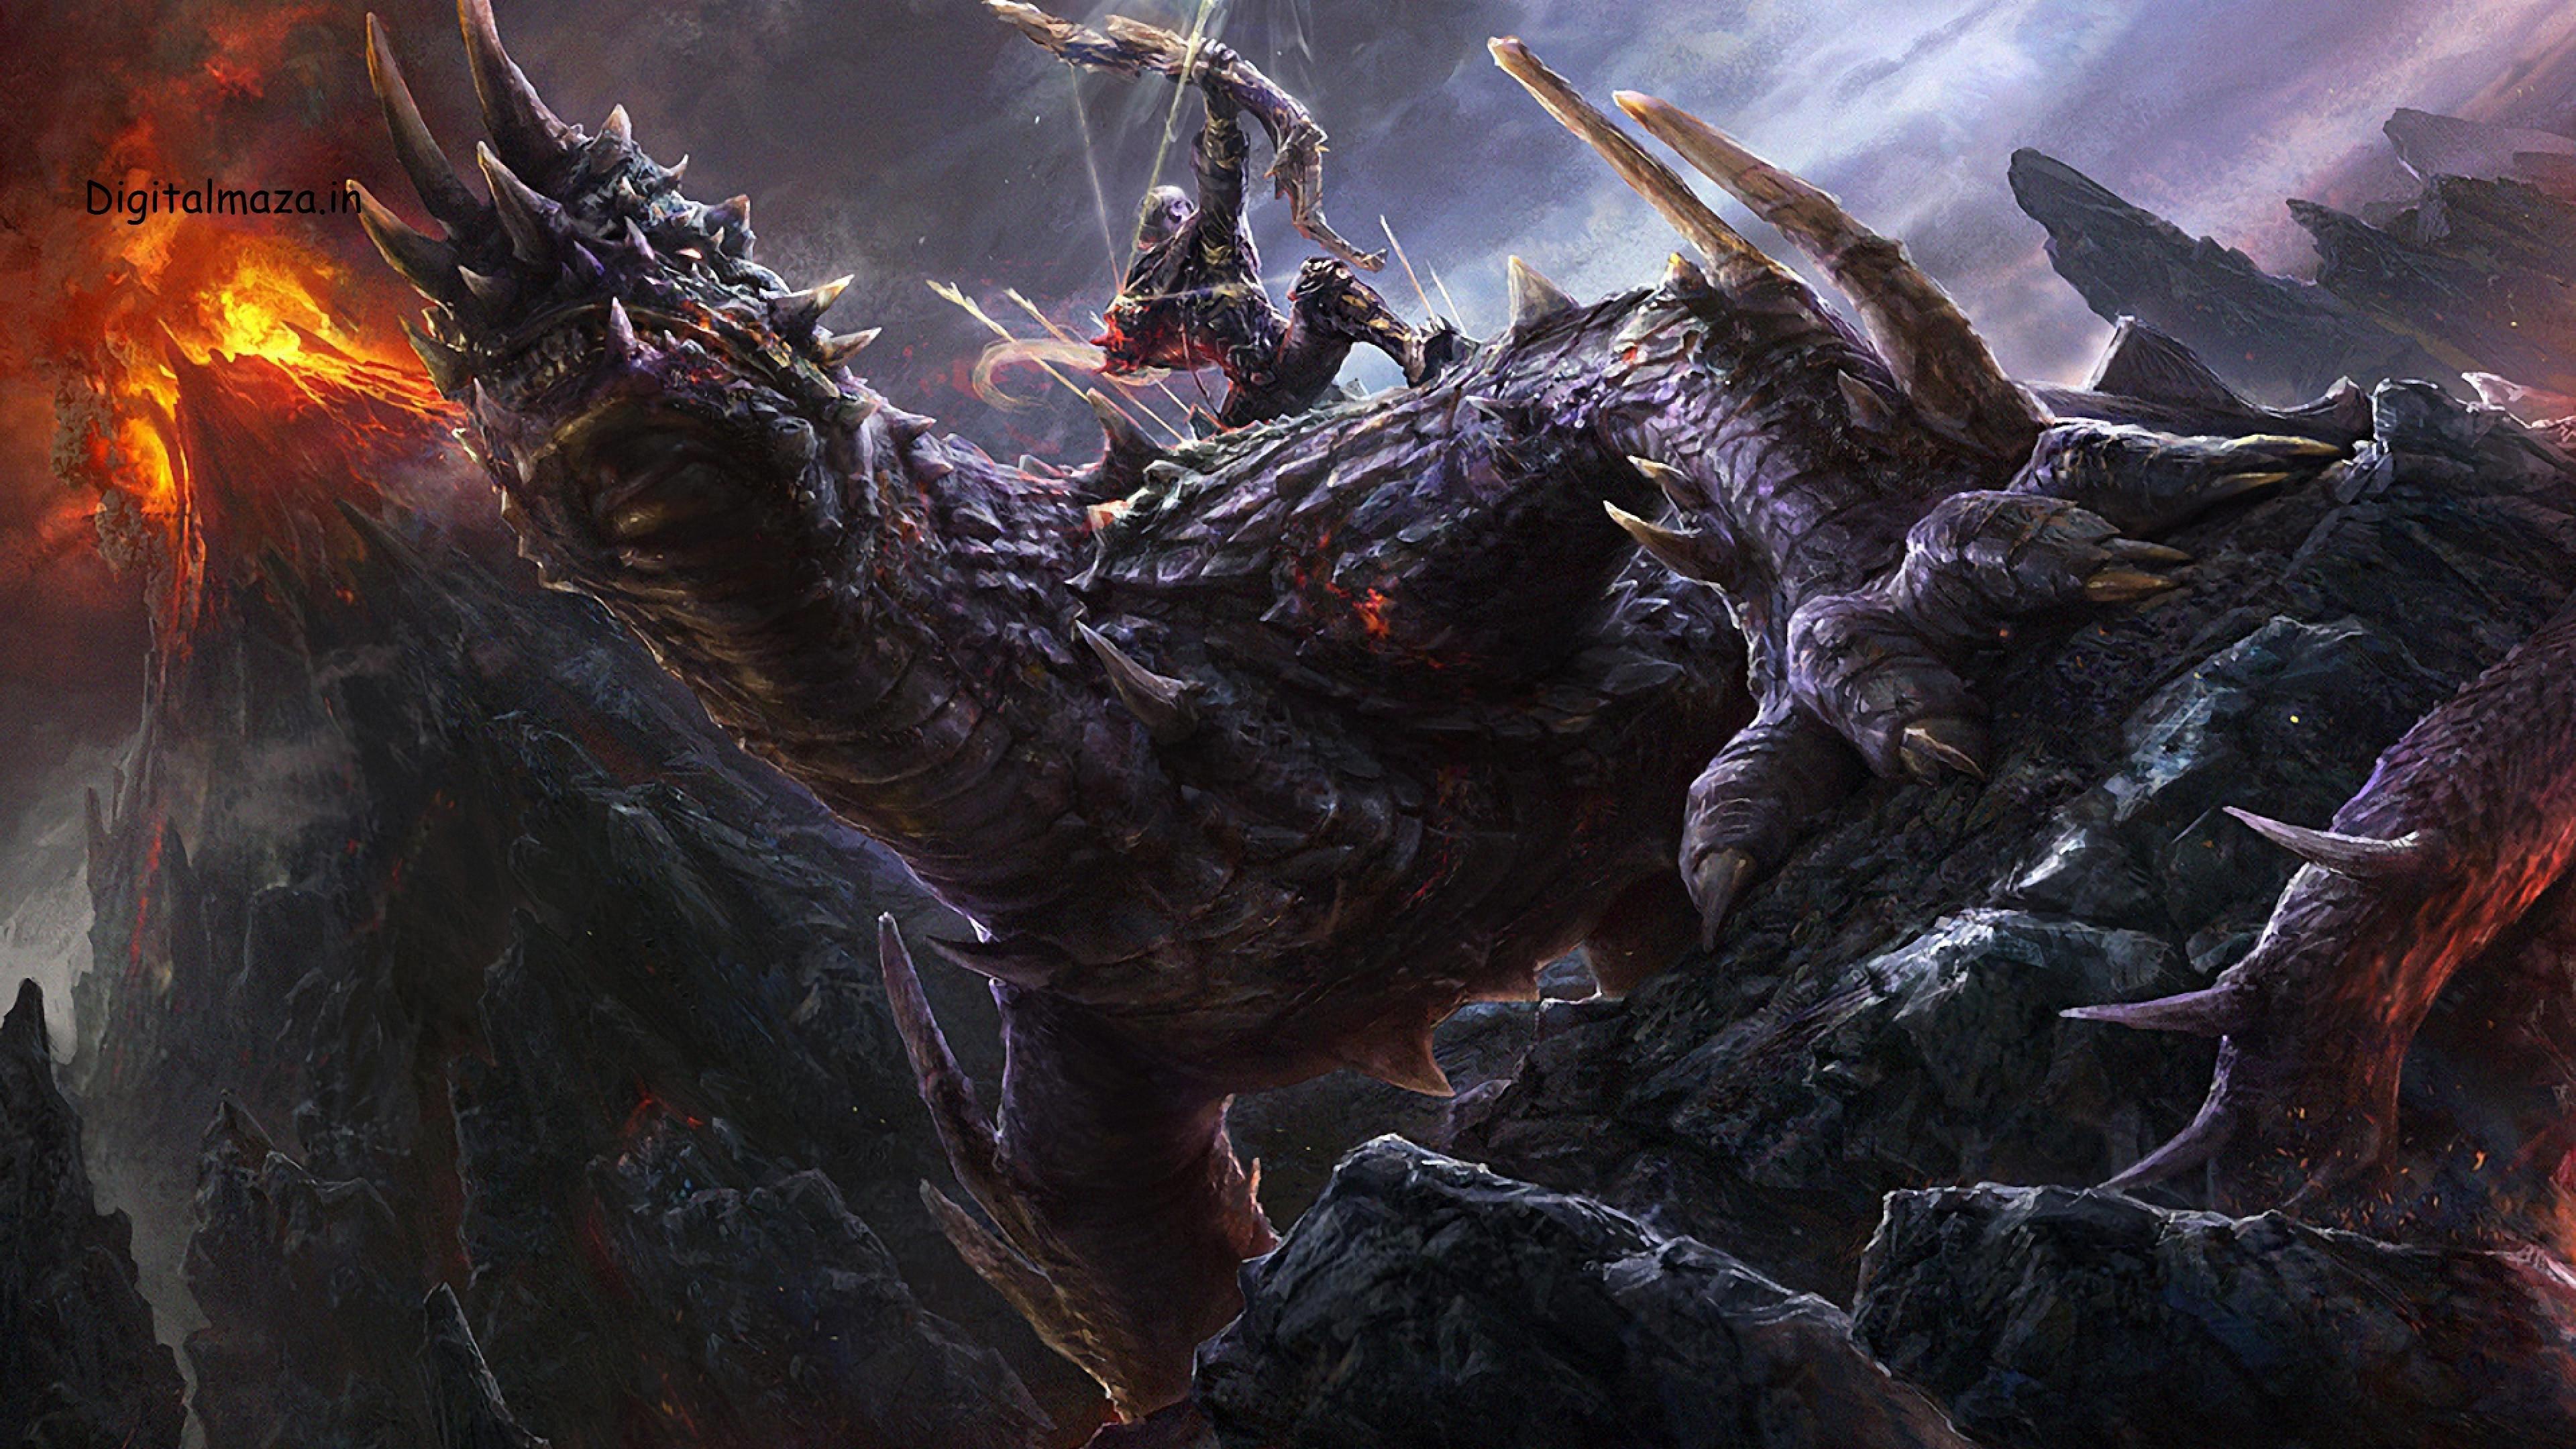 … 26 Amazing 4K Ultra HD Dragon Fantasy Computer Desktop Wallpapers .